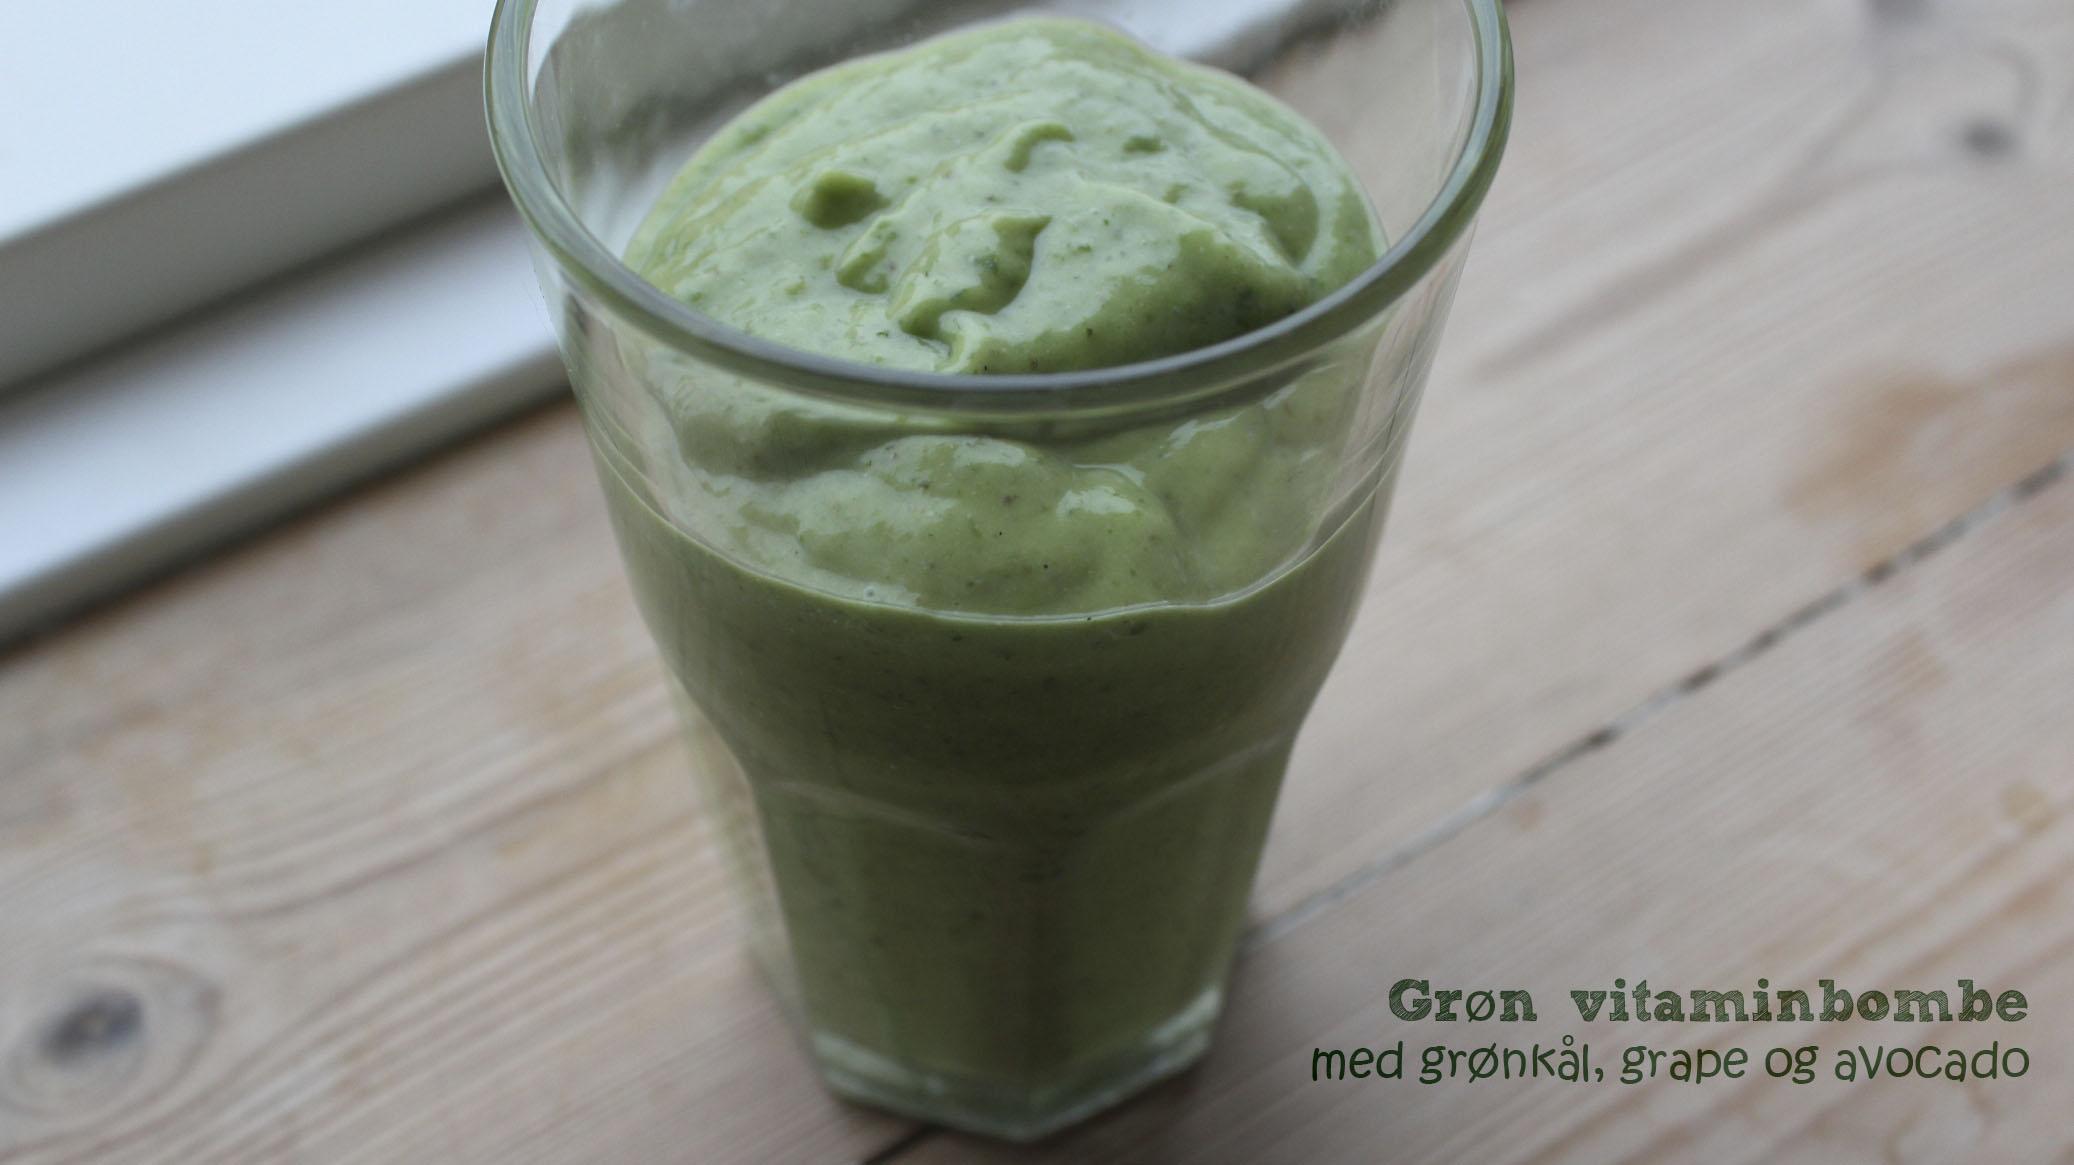 Grøn vitaminbombe